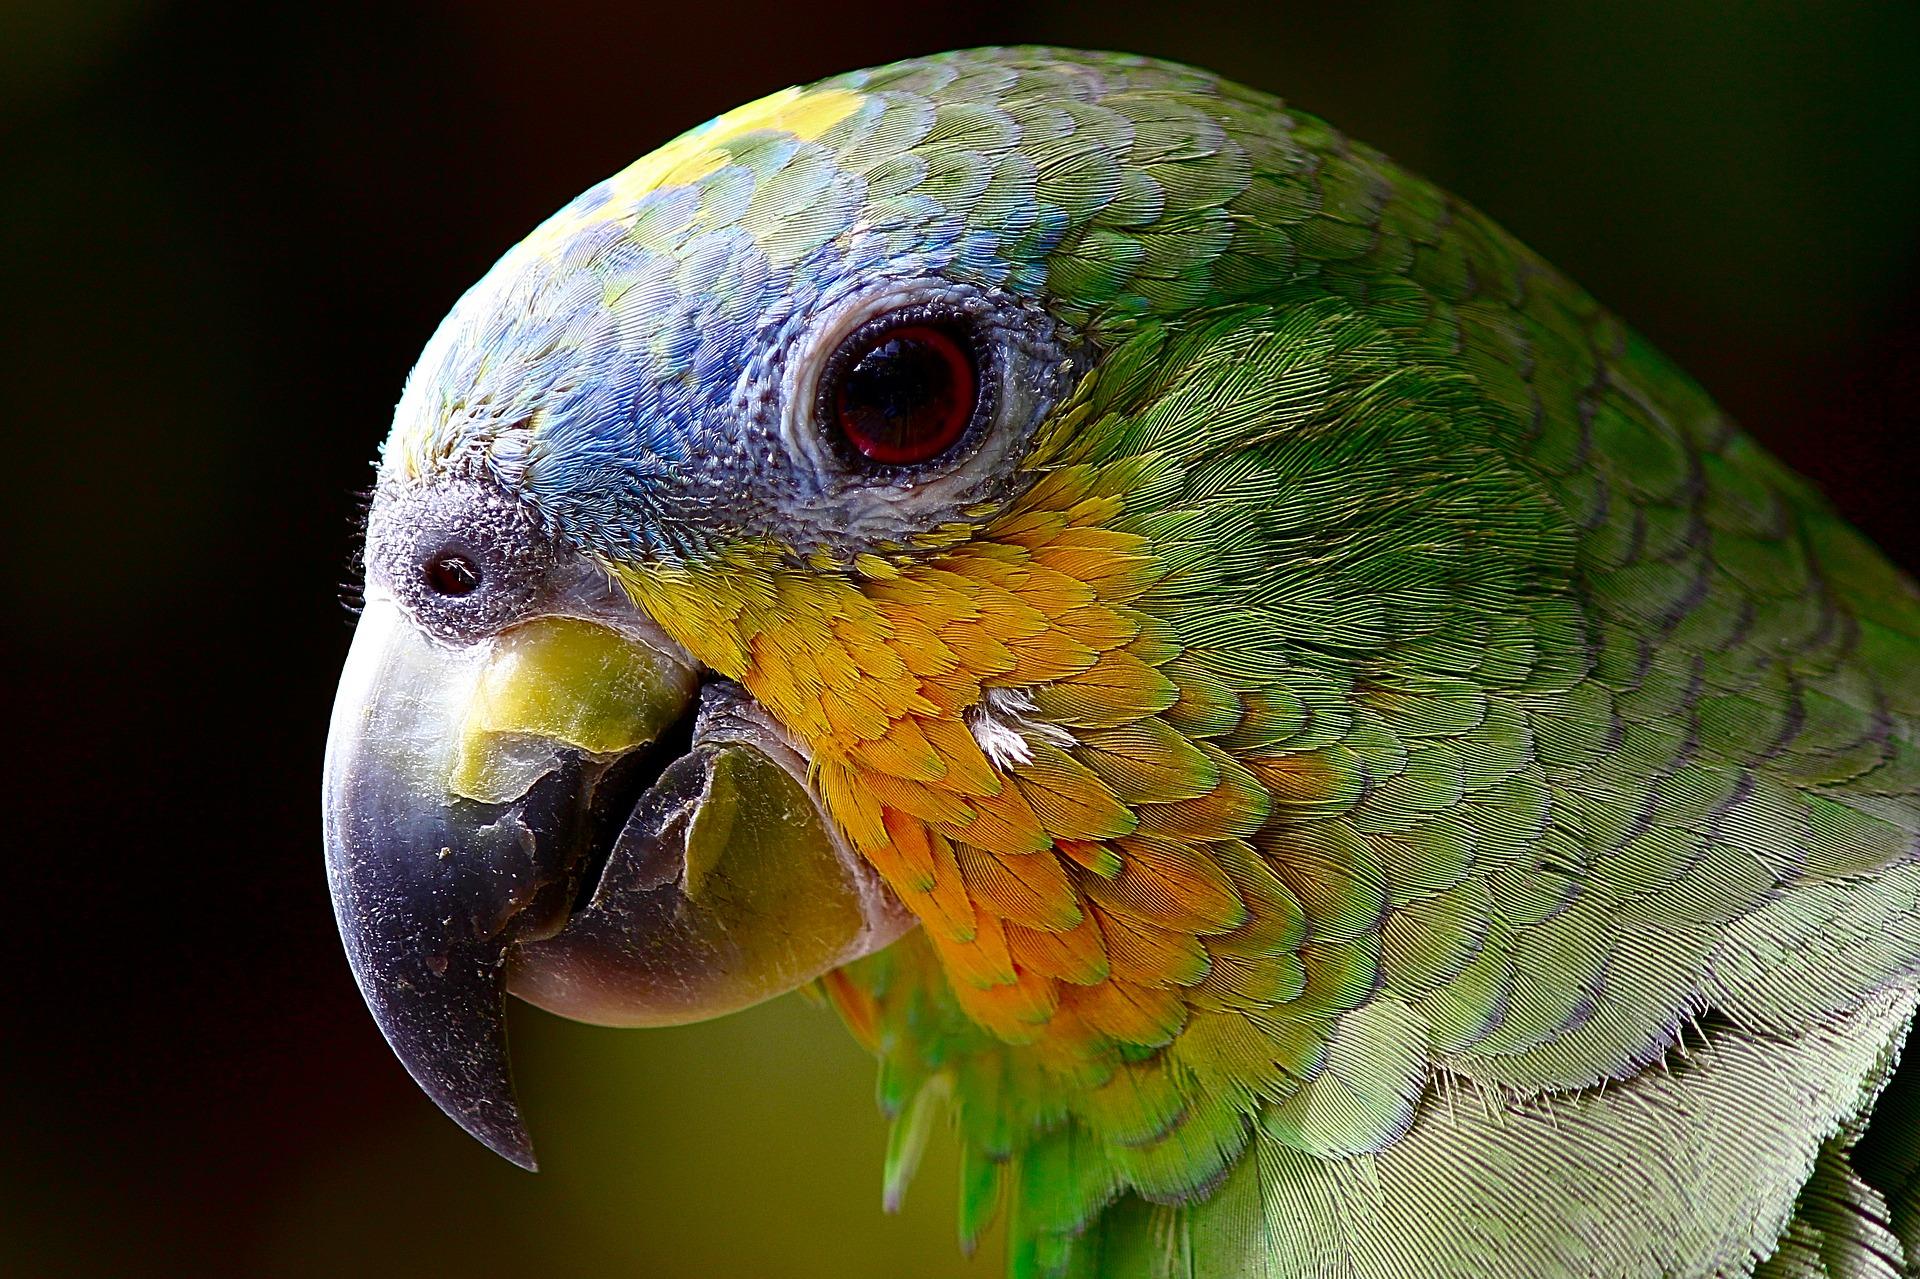 download wallpaper: papegaai wallpaper